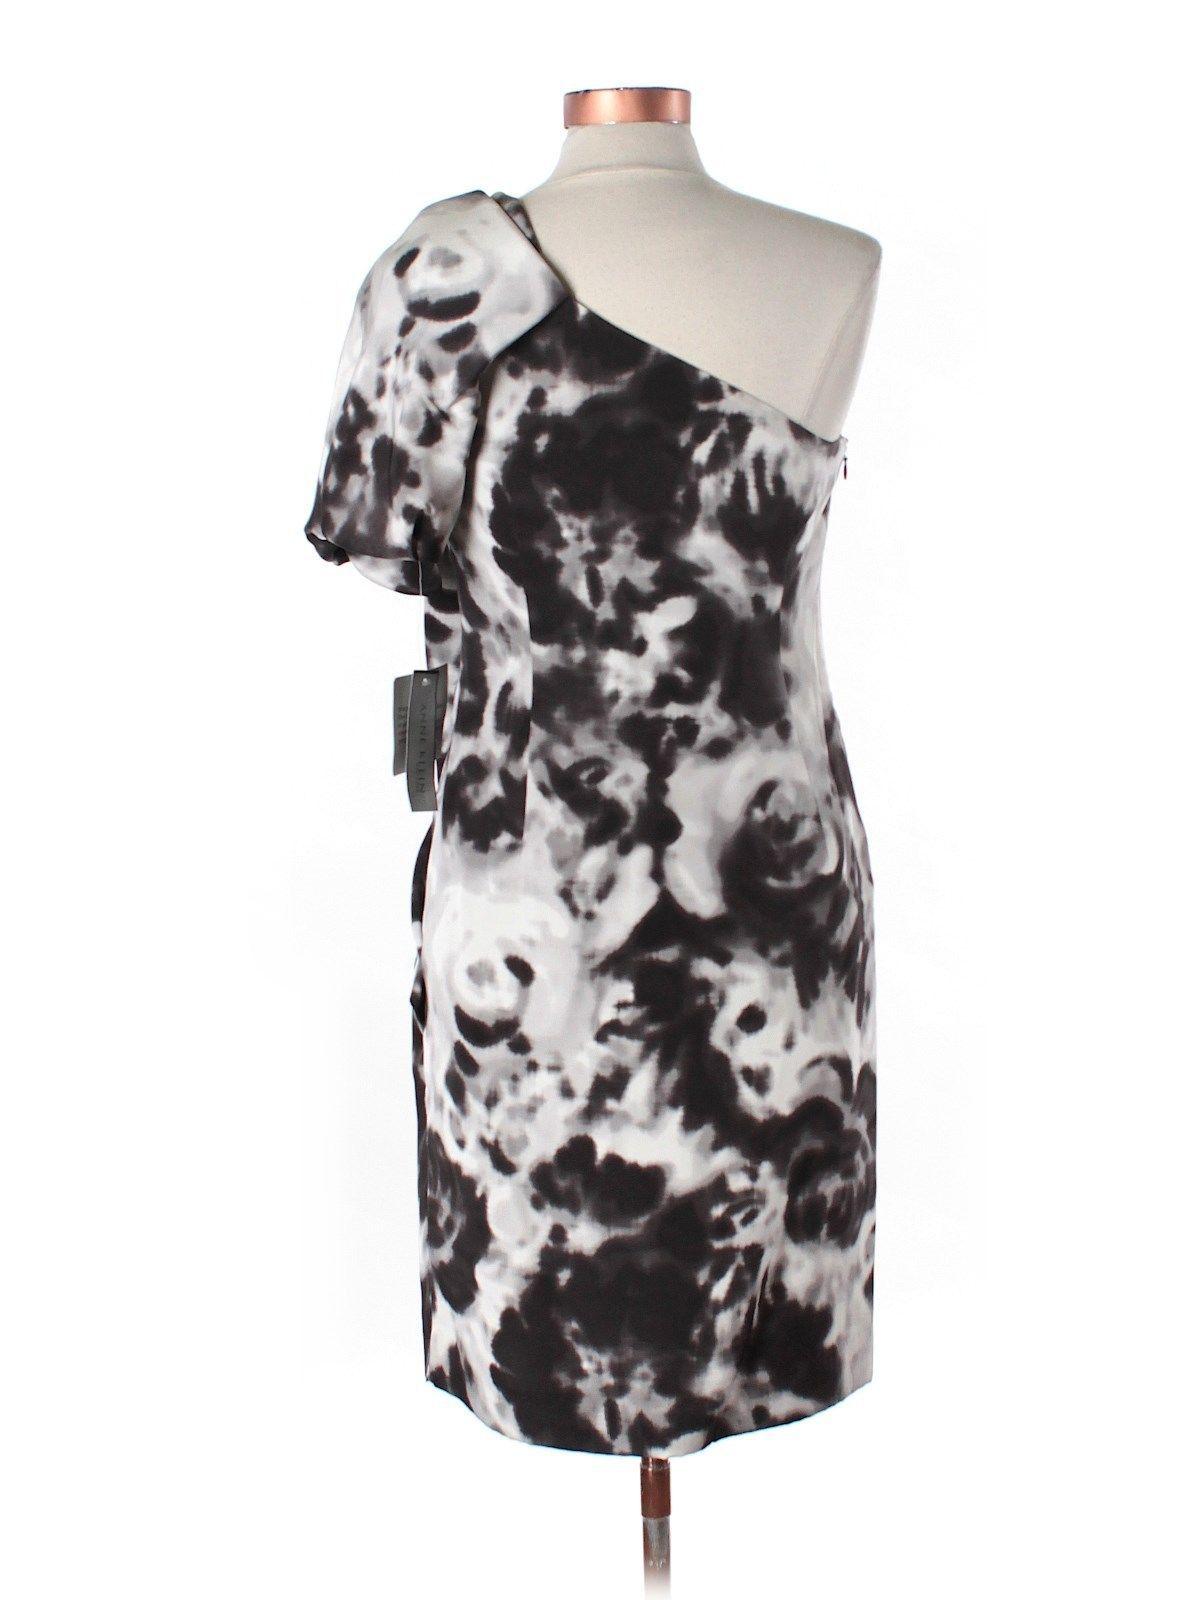 Anne Klein Asymmetric Silk Cocktail Evening Dress One shoulder NWT 6 M Black